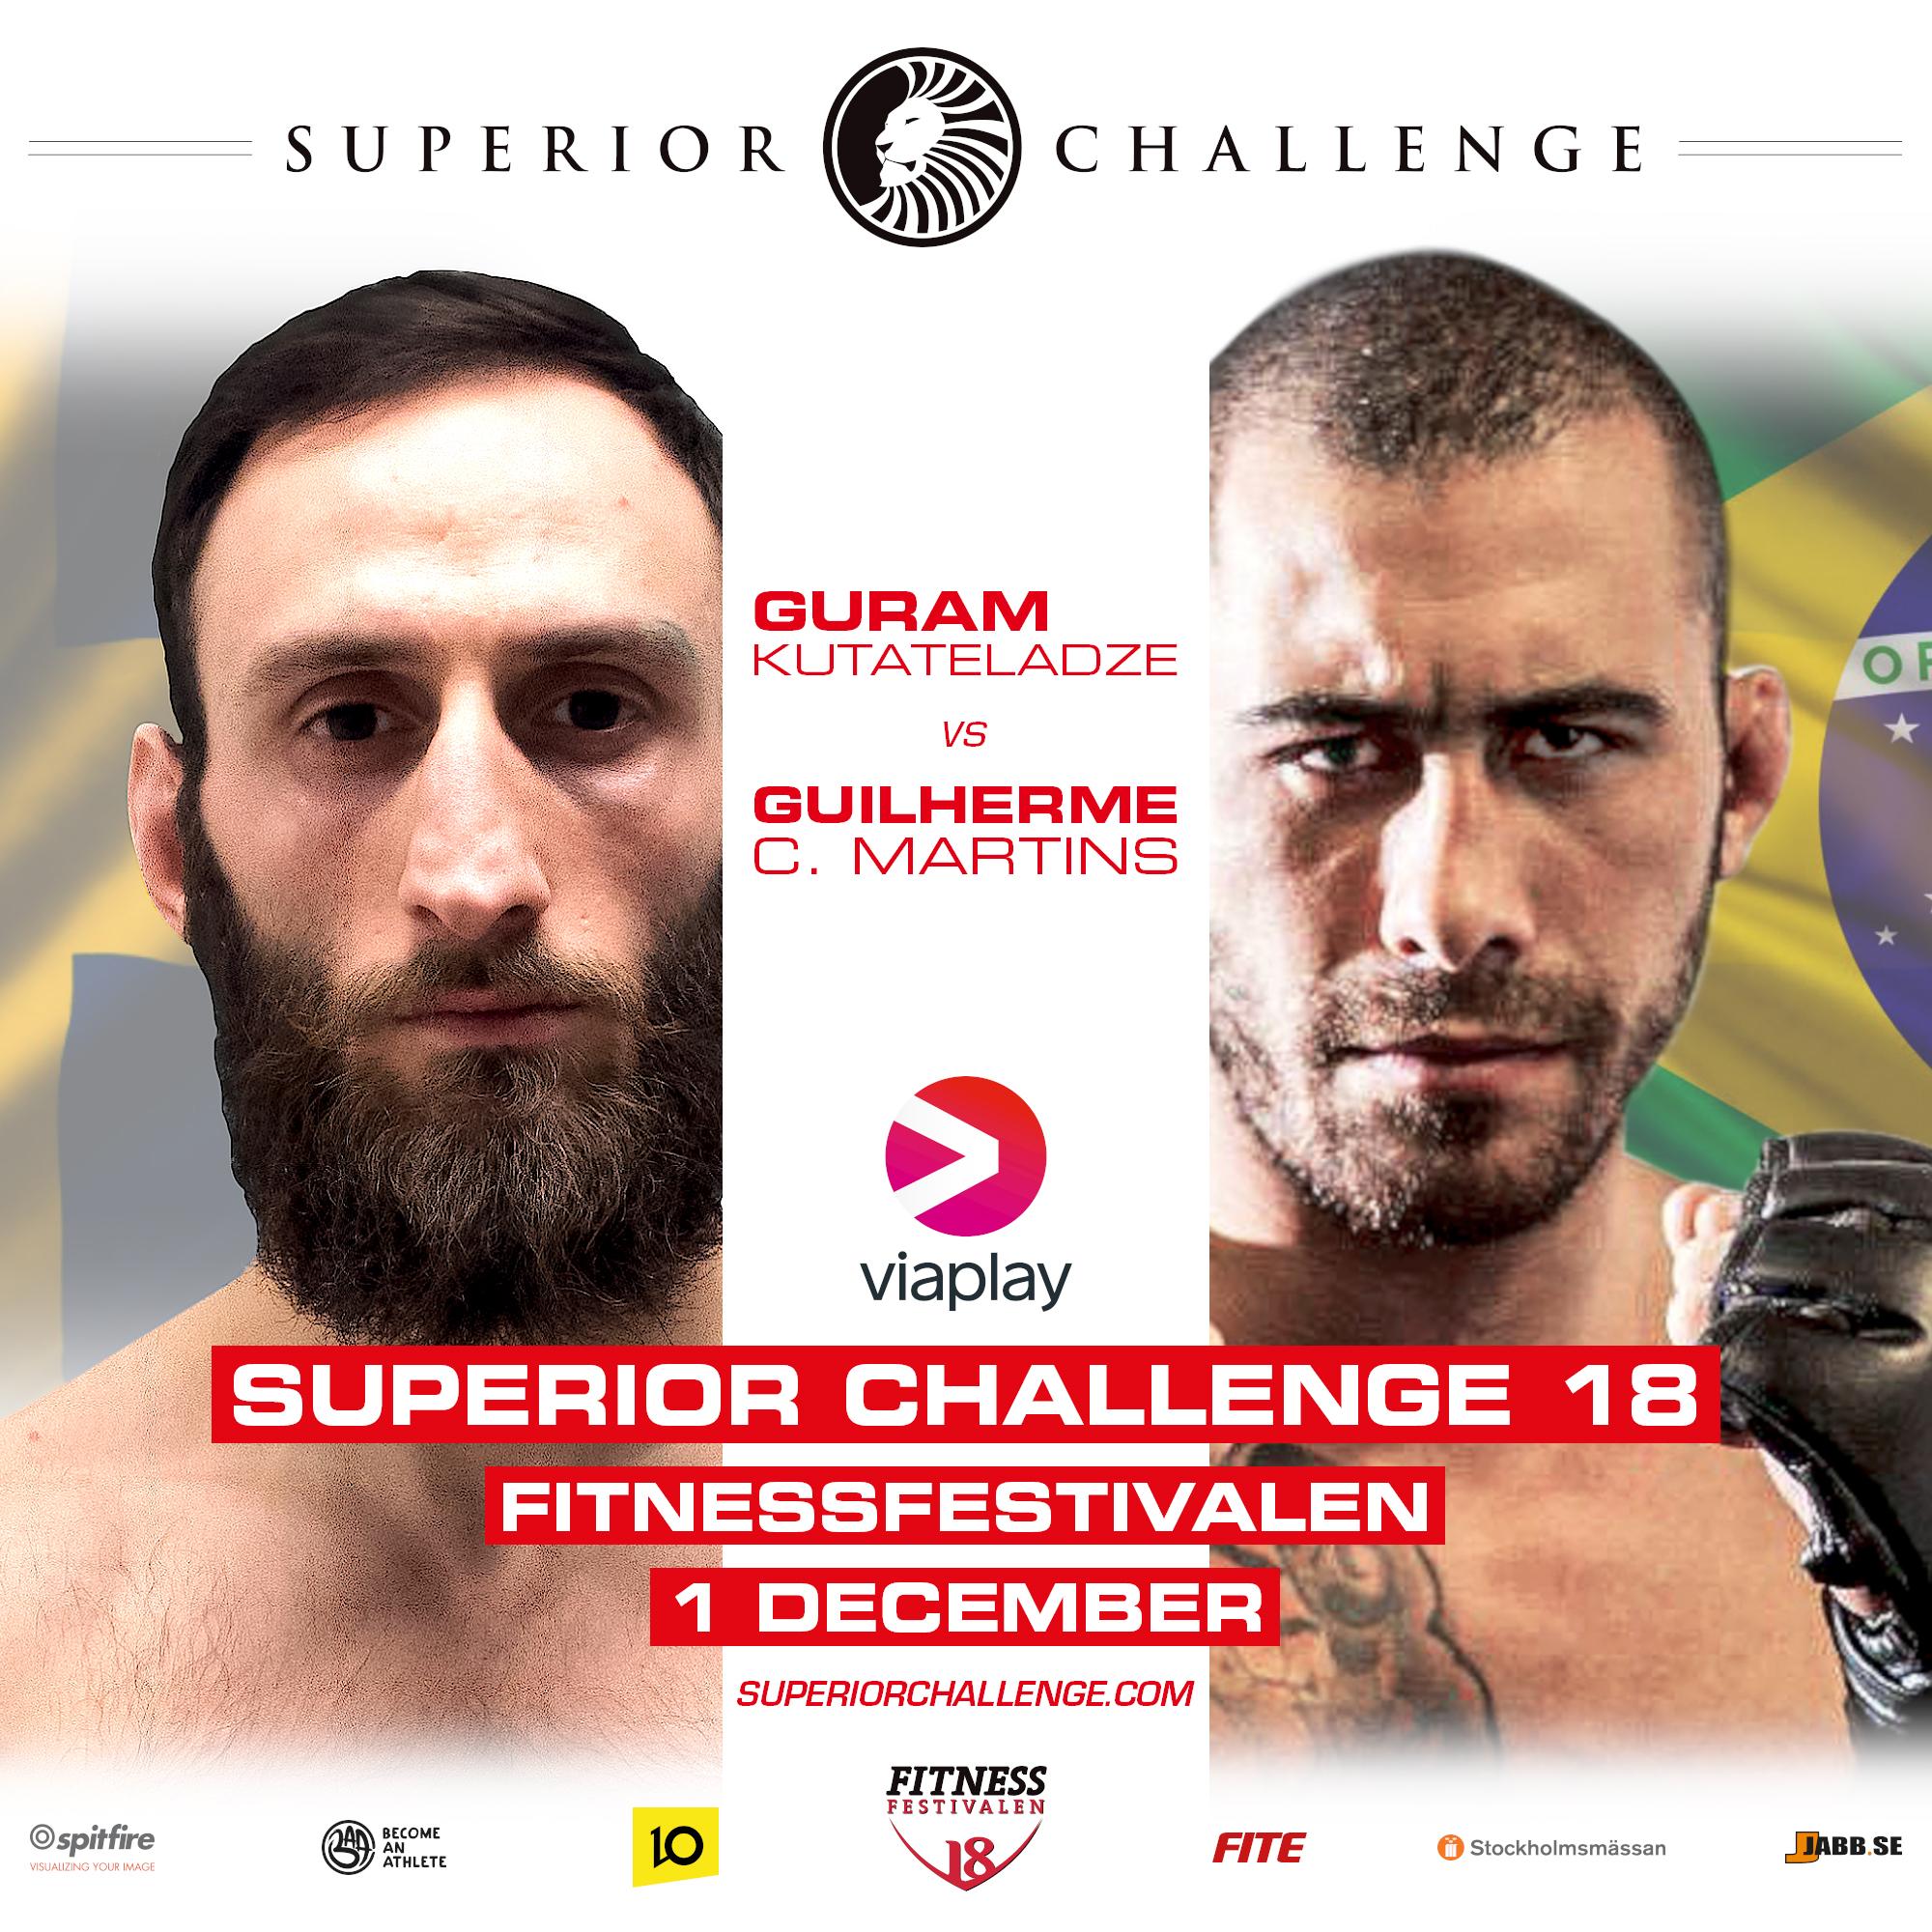 Fight Presentation Superior Challenge 18 Fitnessfestivalen Guram Kutateladze vs Guilherme C Martins